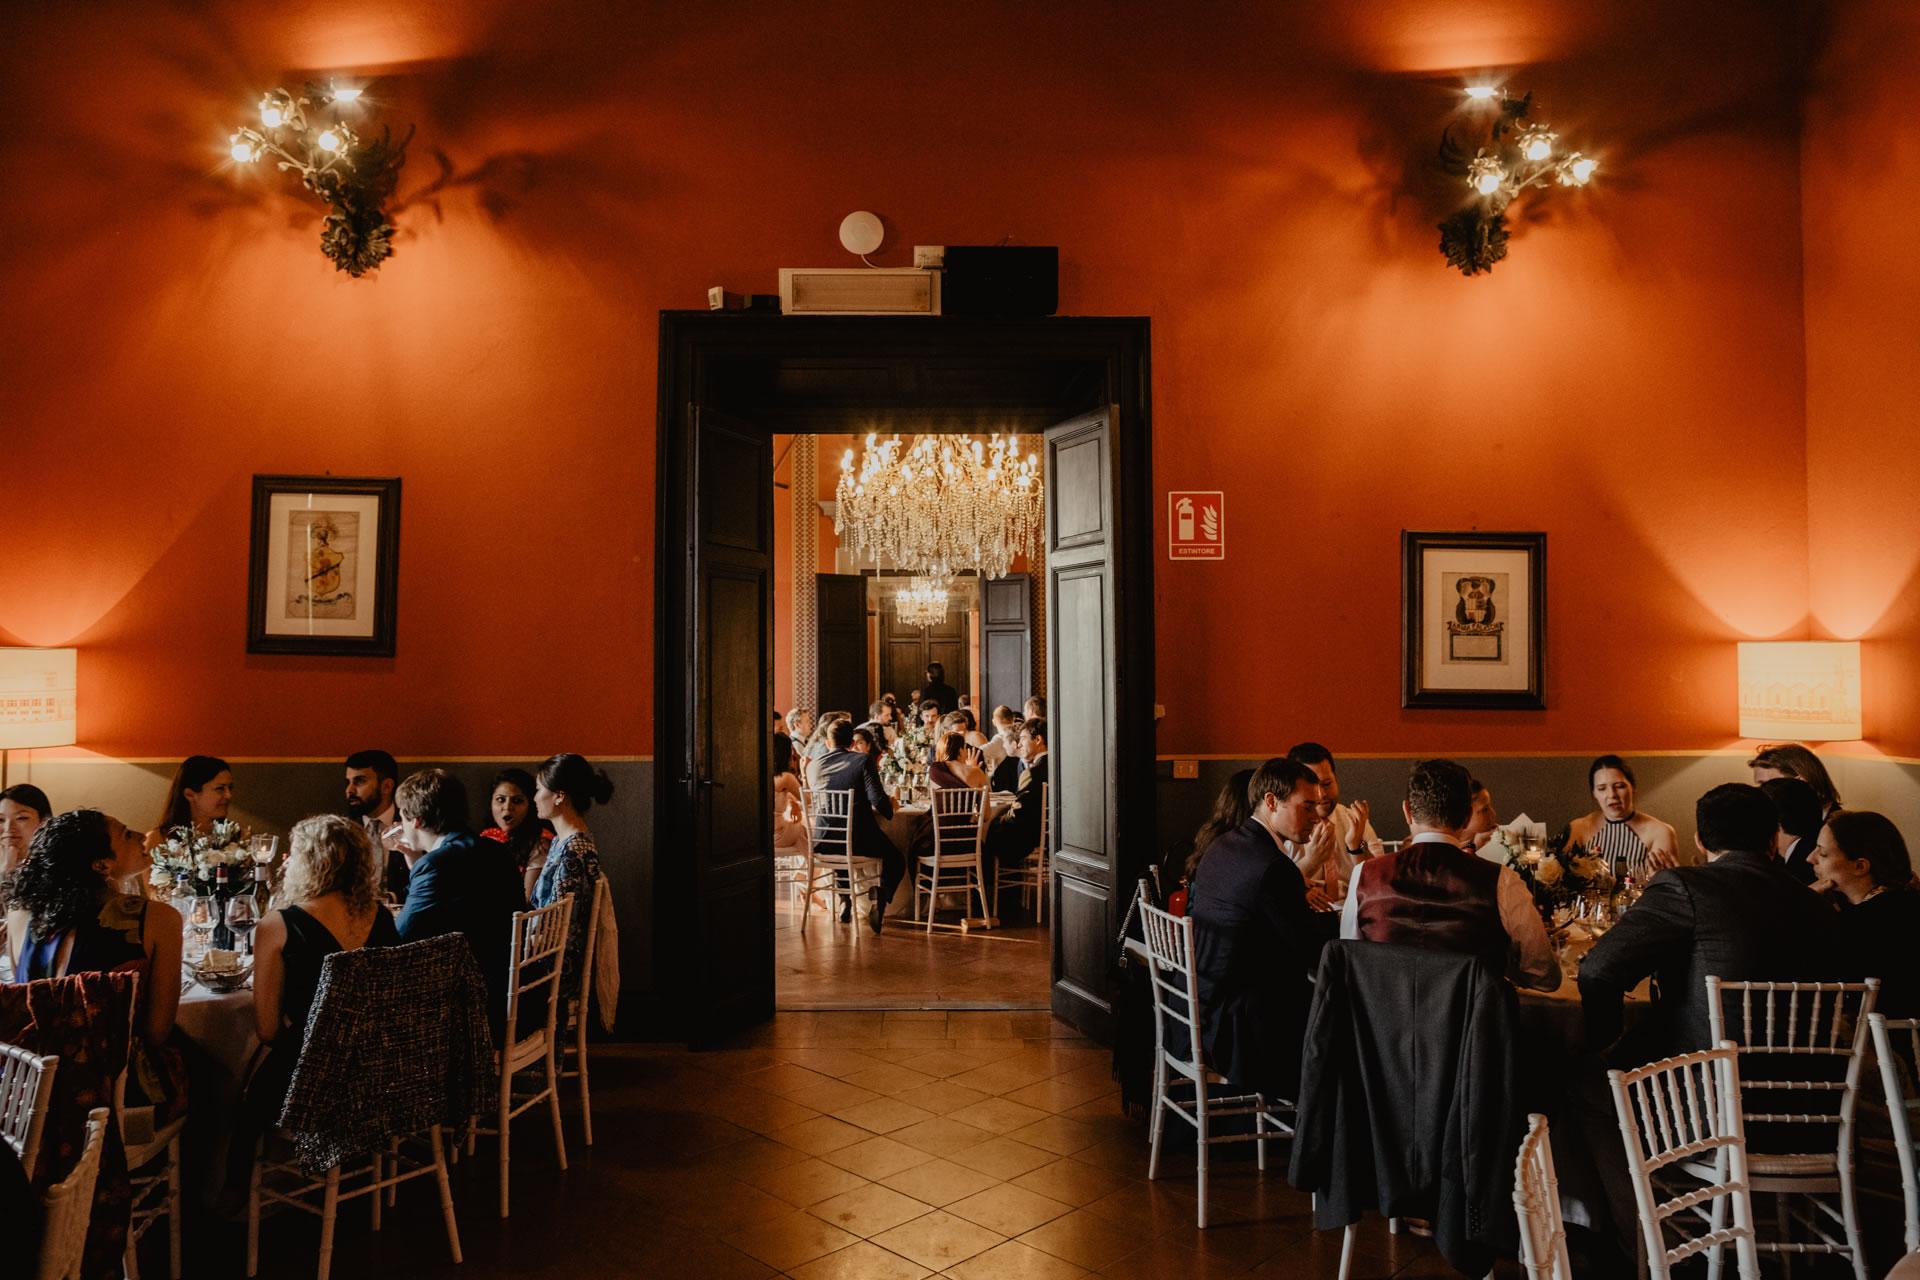 - 63 :: Indian wedding ceremony at Villa Pitiana :: Luxury wedding photography - 62 ::  - 63